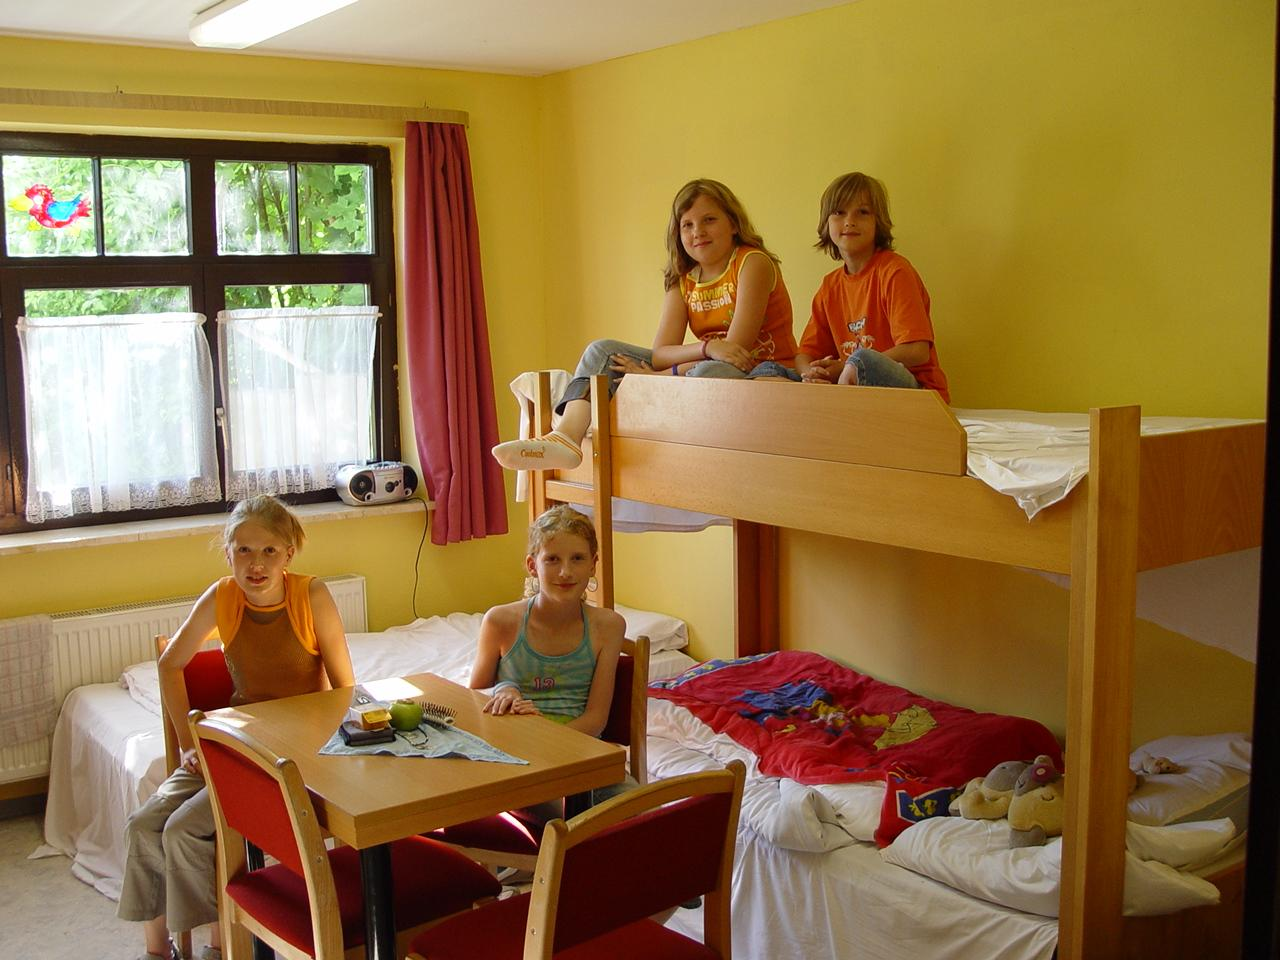 Jugendherberge-Mühlhausen-Zimmer.jpg